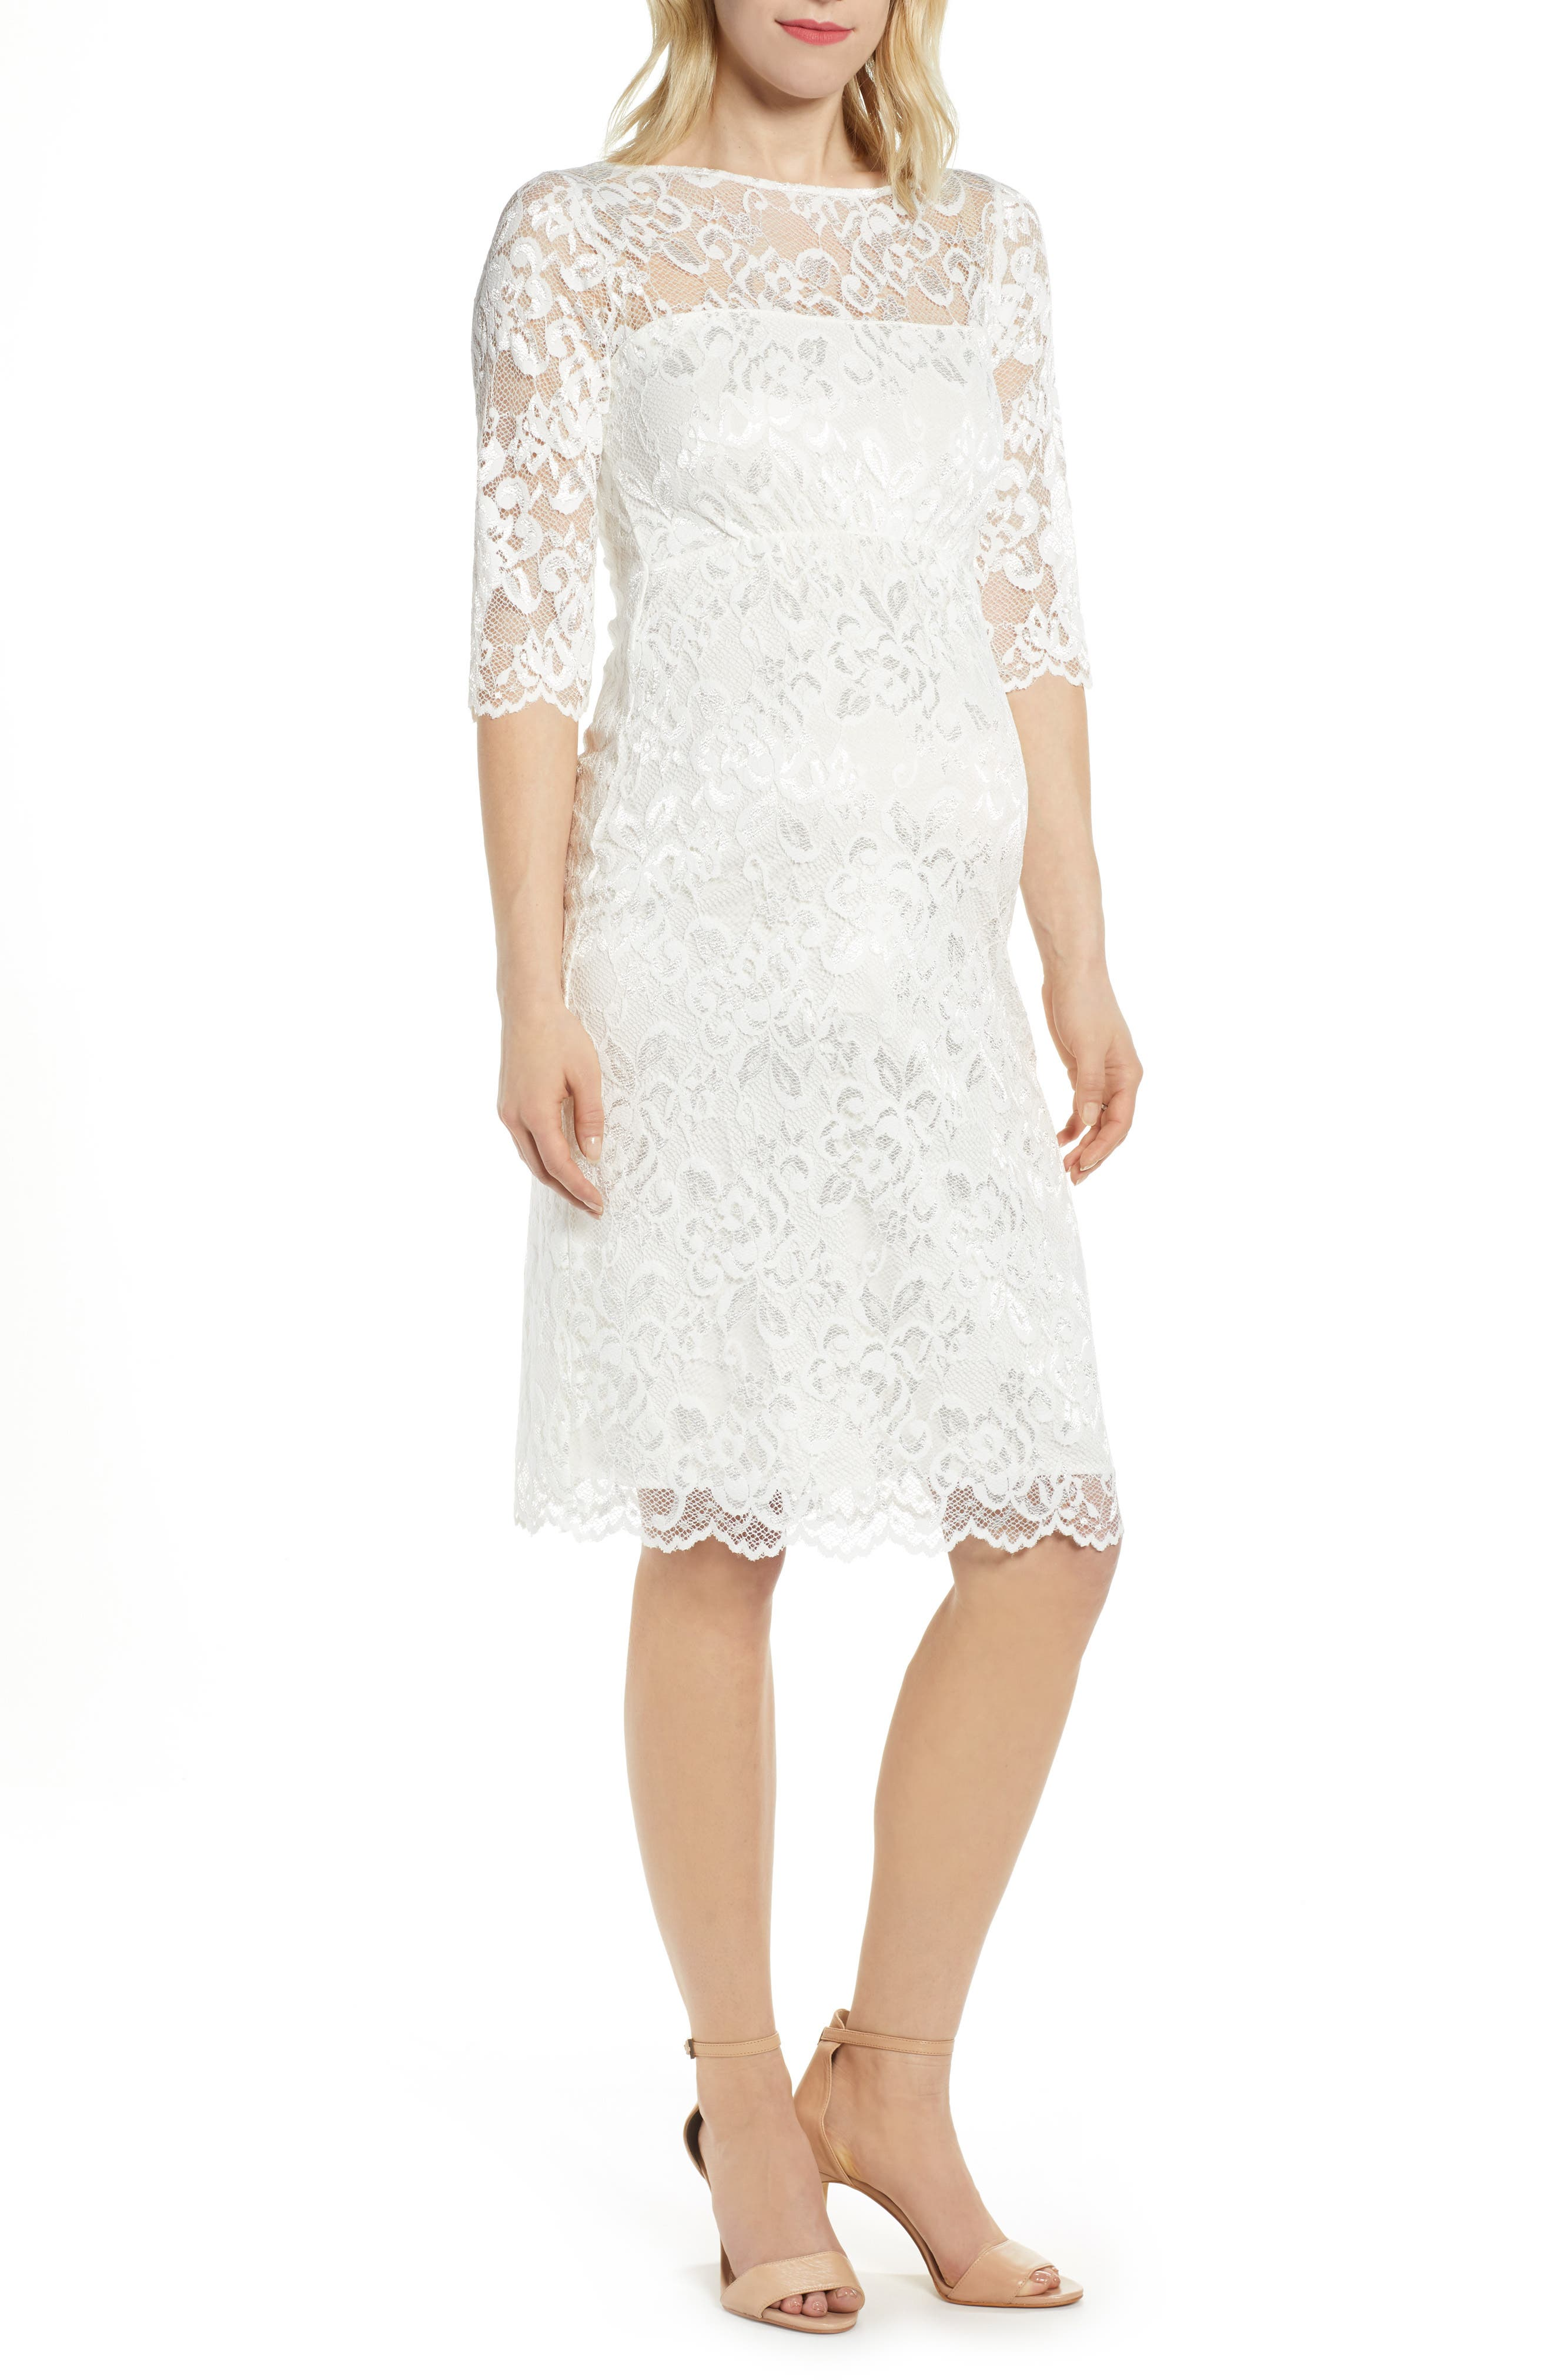 Tiffany Rose Amelia Lace Maternity Sheath Dress, White